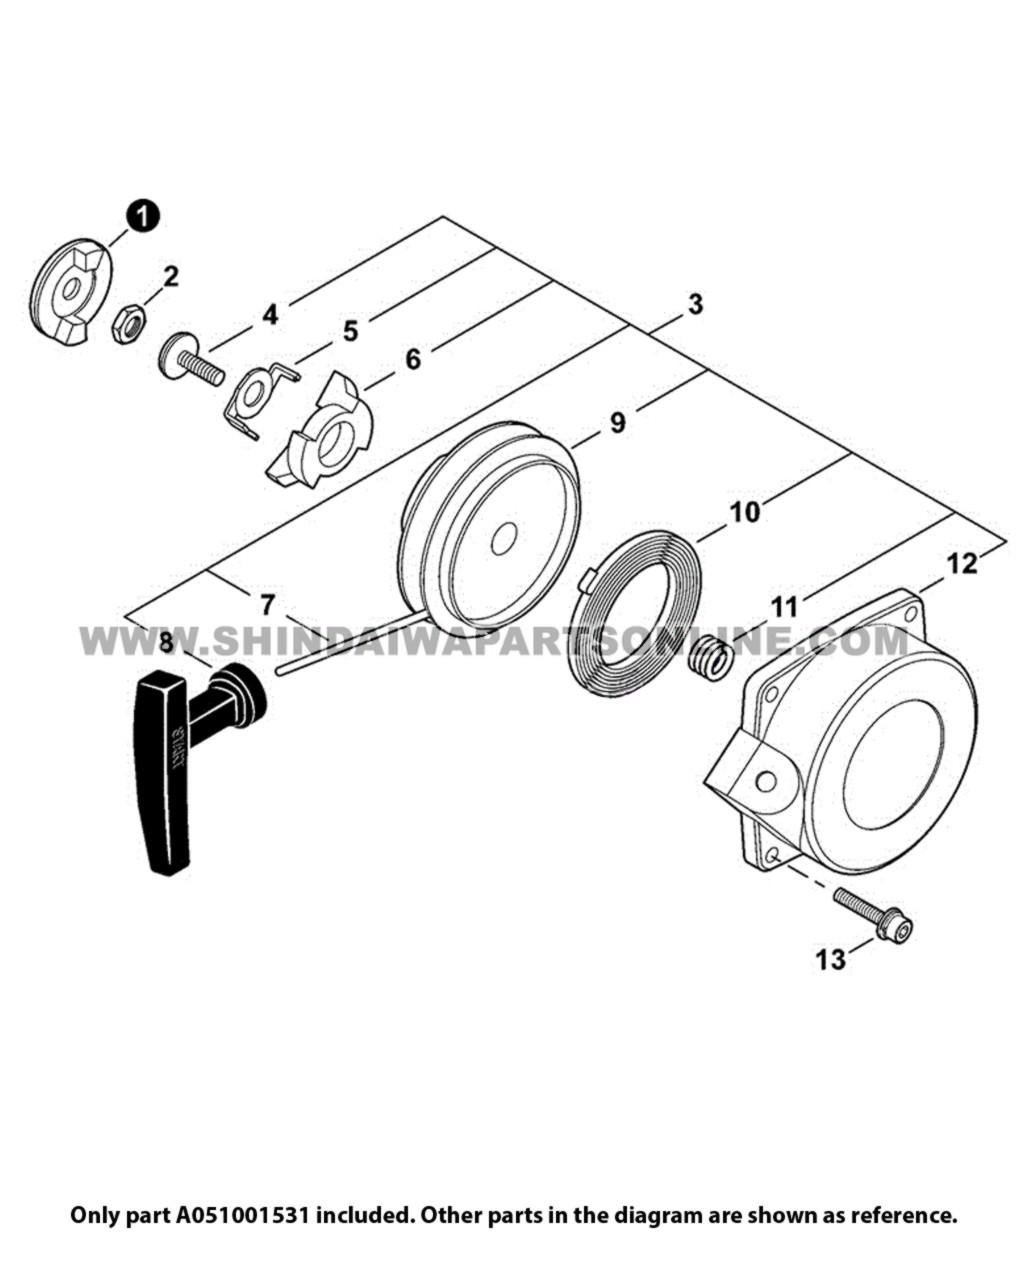 Parts lookup Shindaiwa EB802 Starter A051001531 OEM diagram